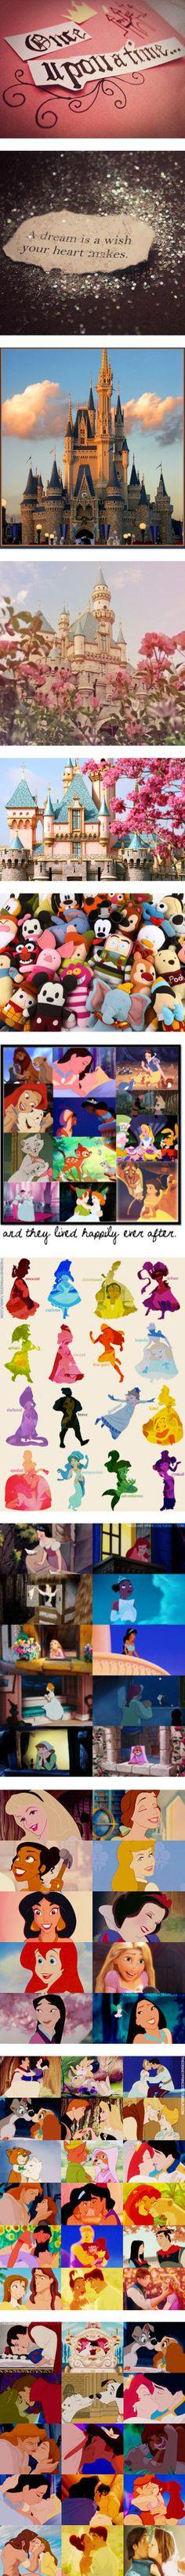 I will always love Disney